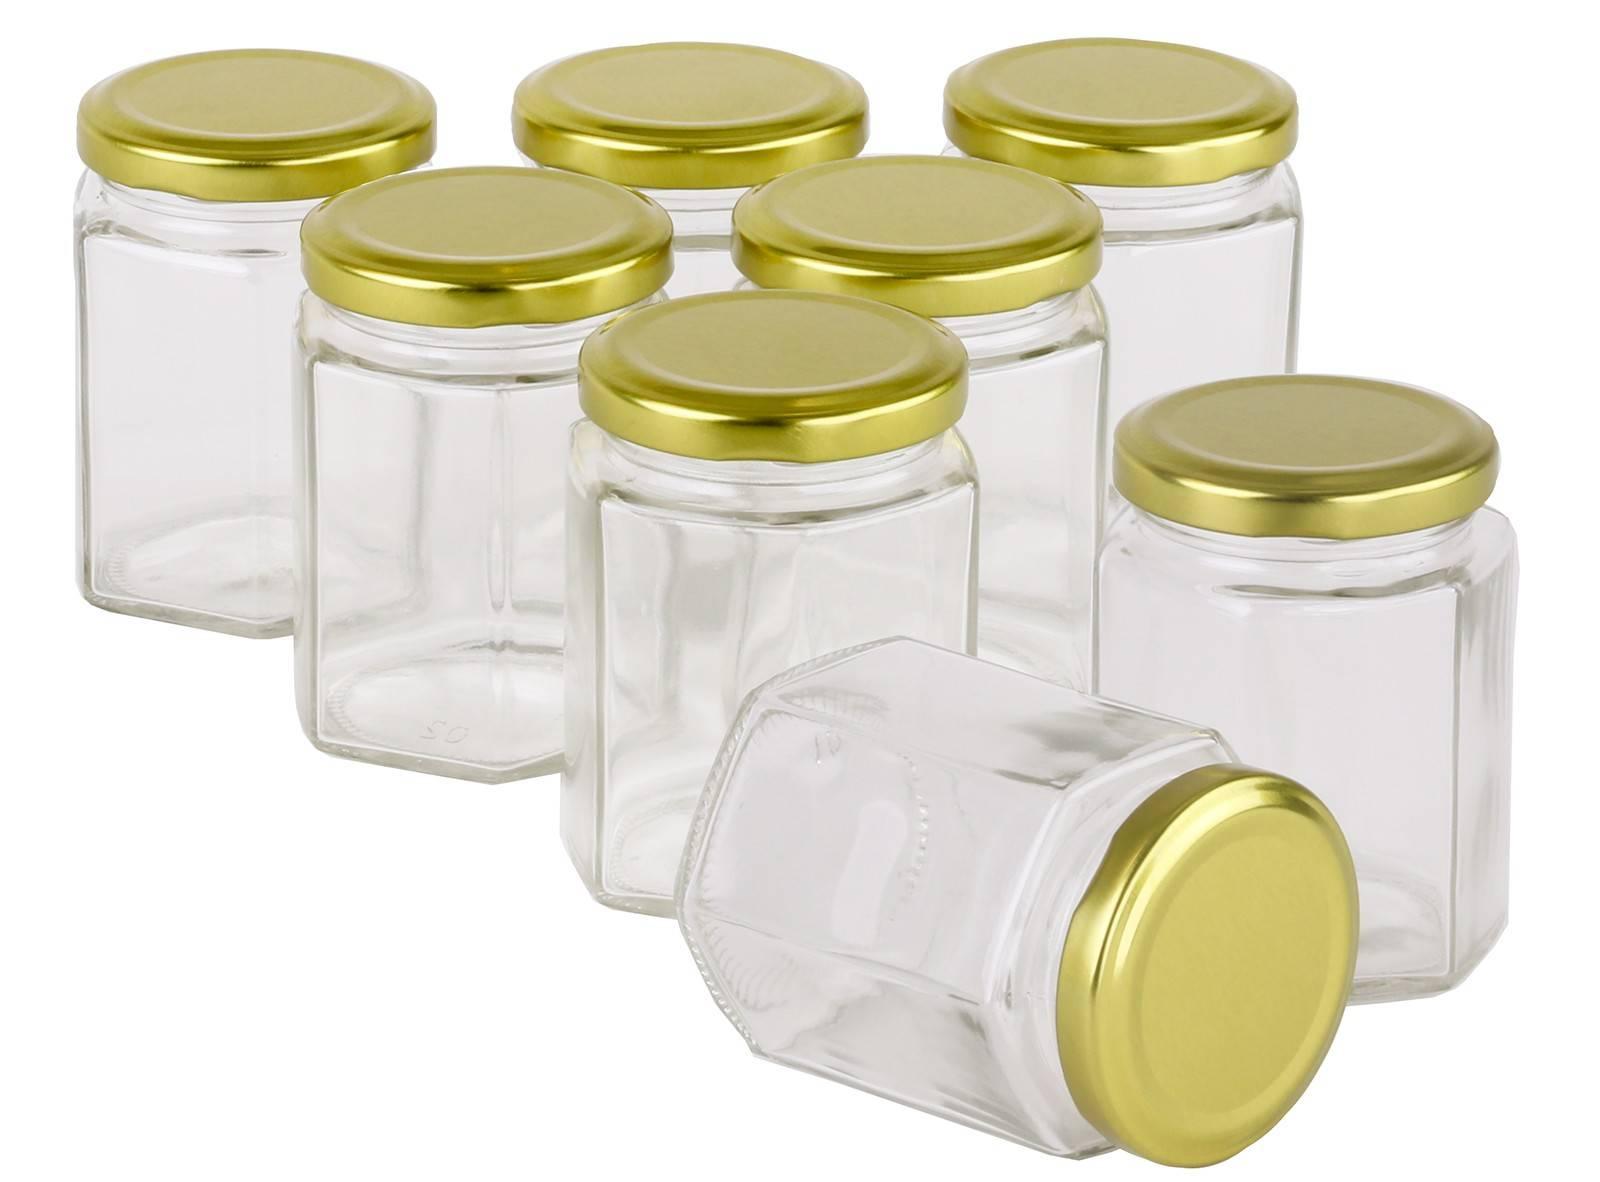 360 pcs Honey Jars 180ml / 250gm size Hexagonal Jars with Gold Lid